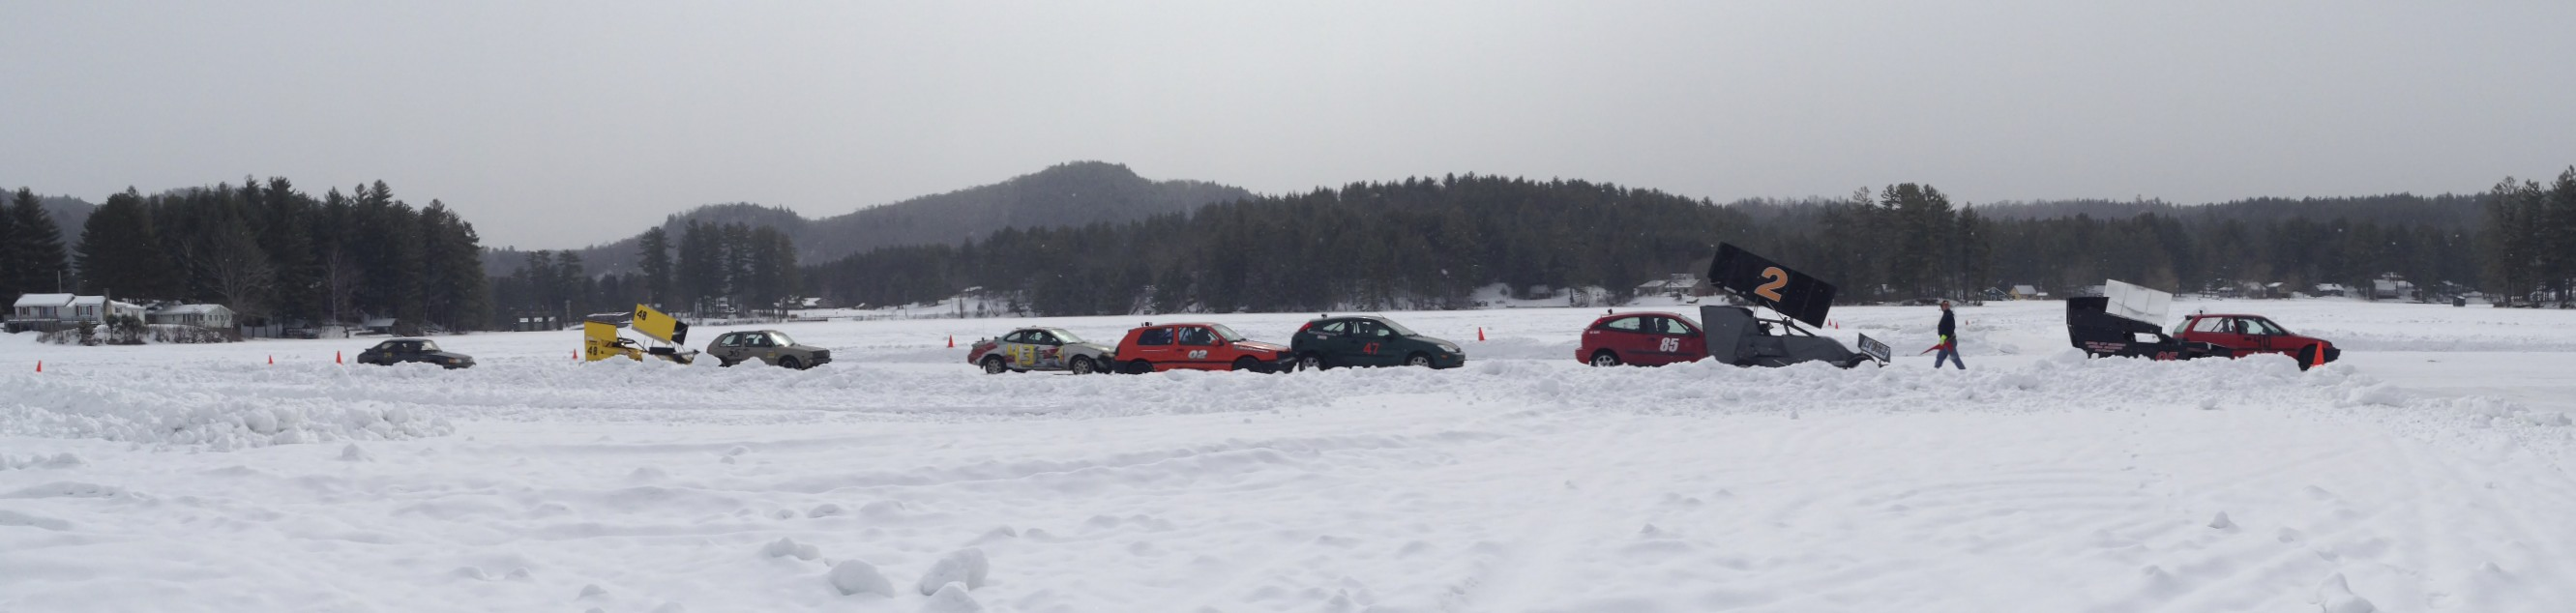 Racing action on the lake.